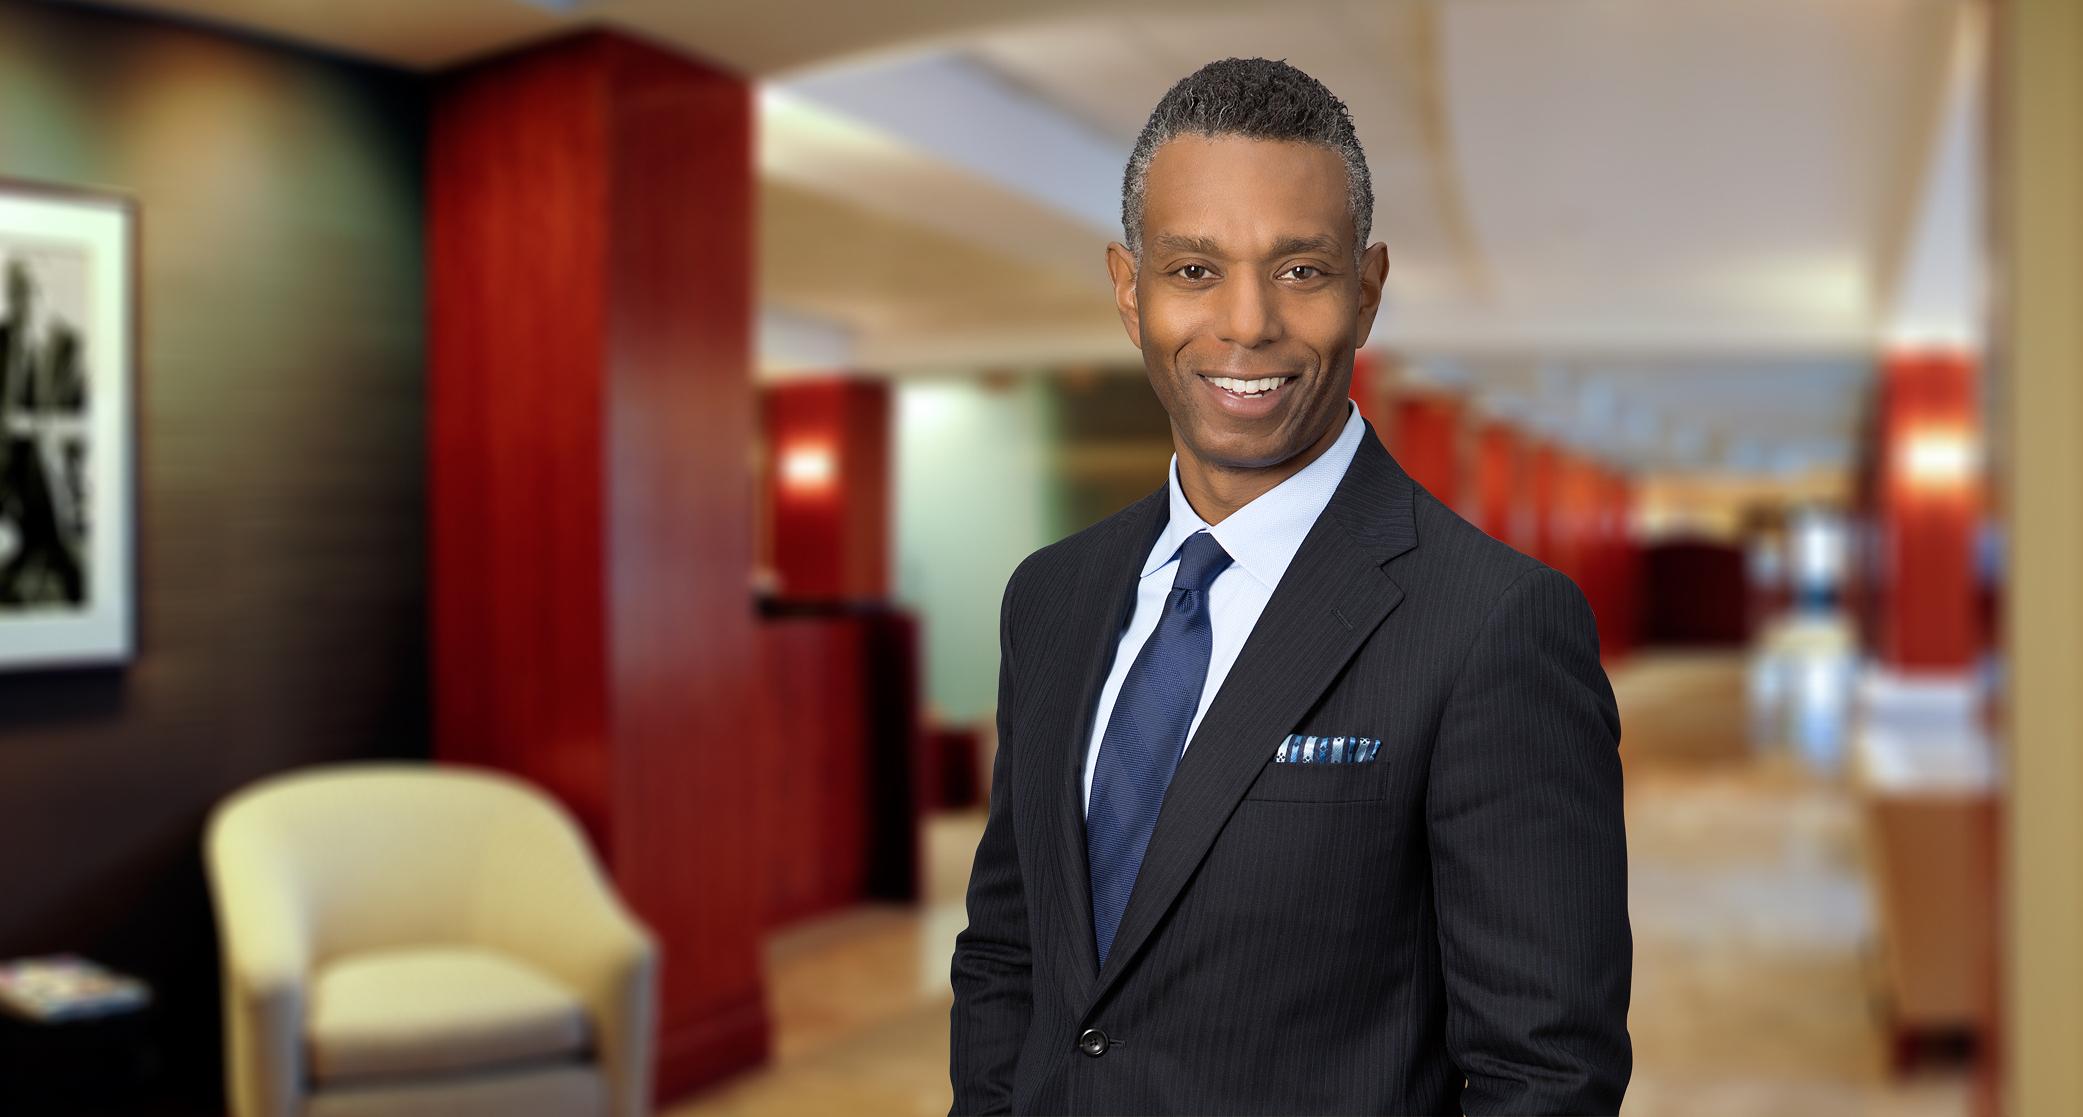 Black Waldorf Maryland Lawyers | Black Waldorf MD Lawyers ...  |Black Lawyers